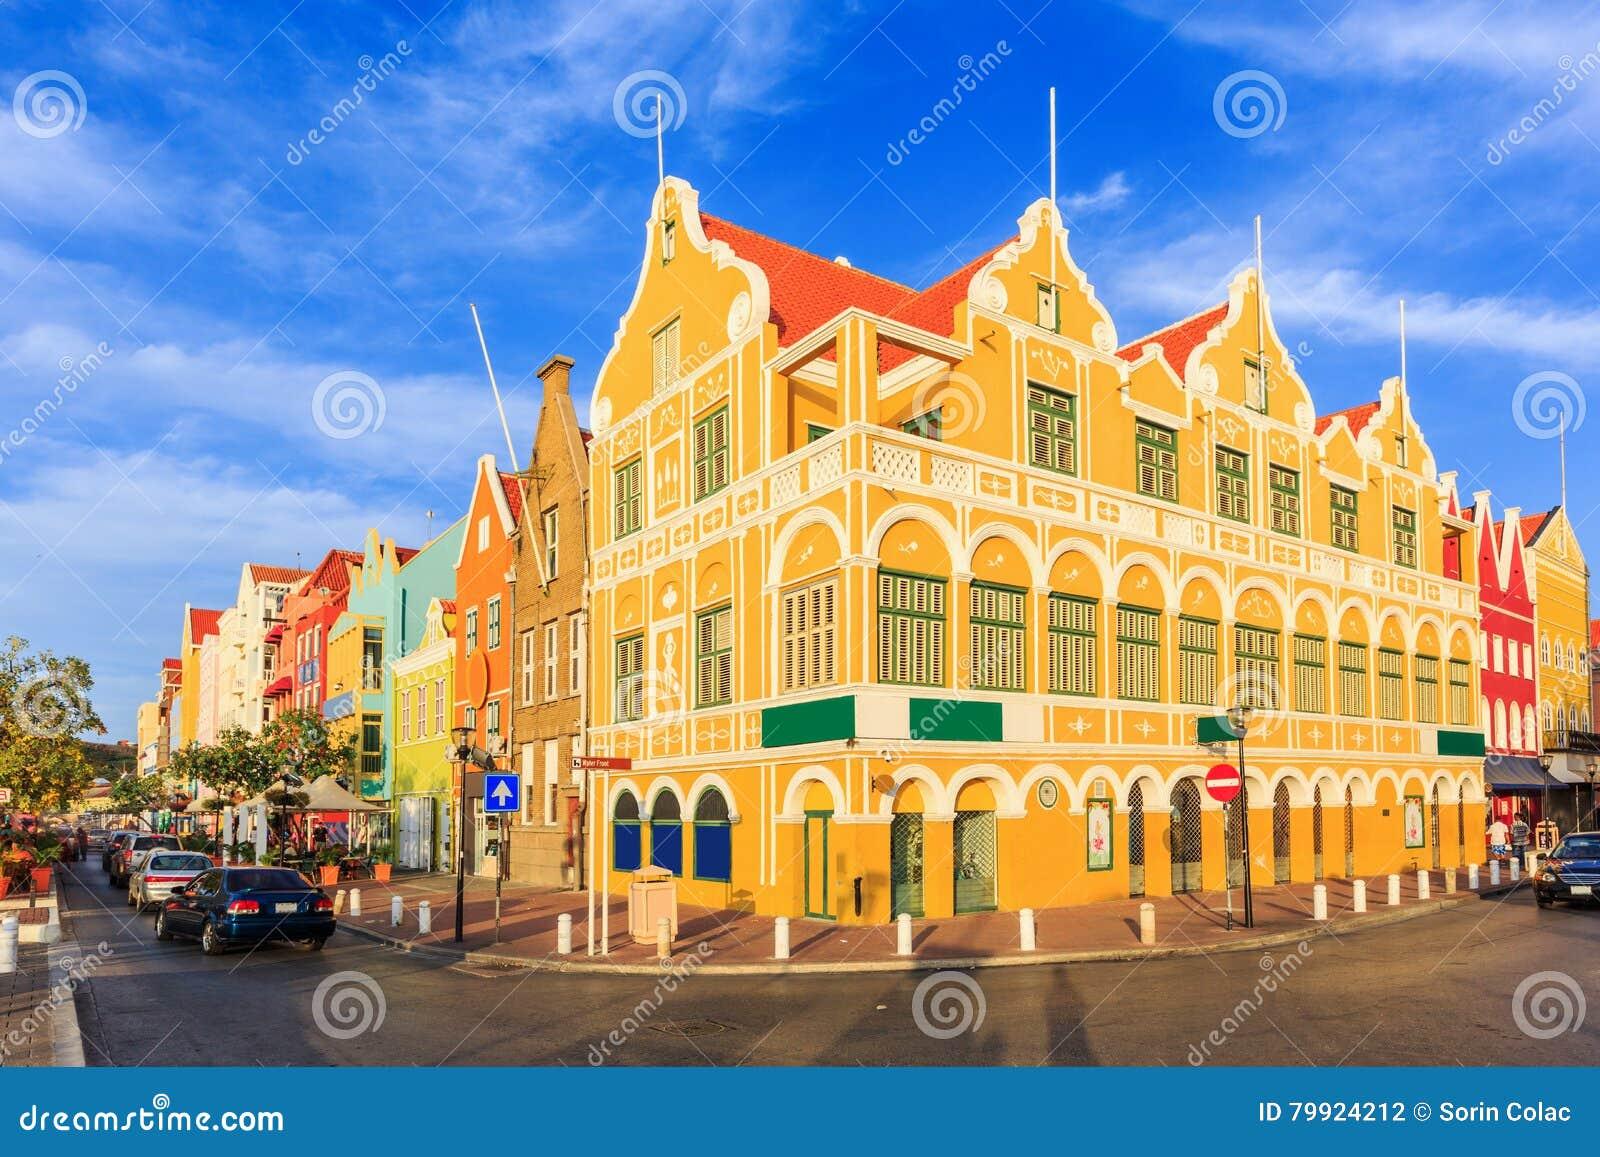 Willemstad 库拉索岛,荷属安的列斯